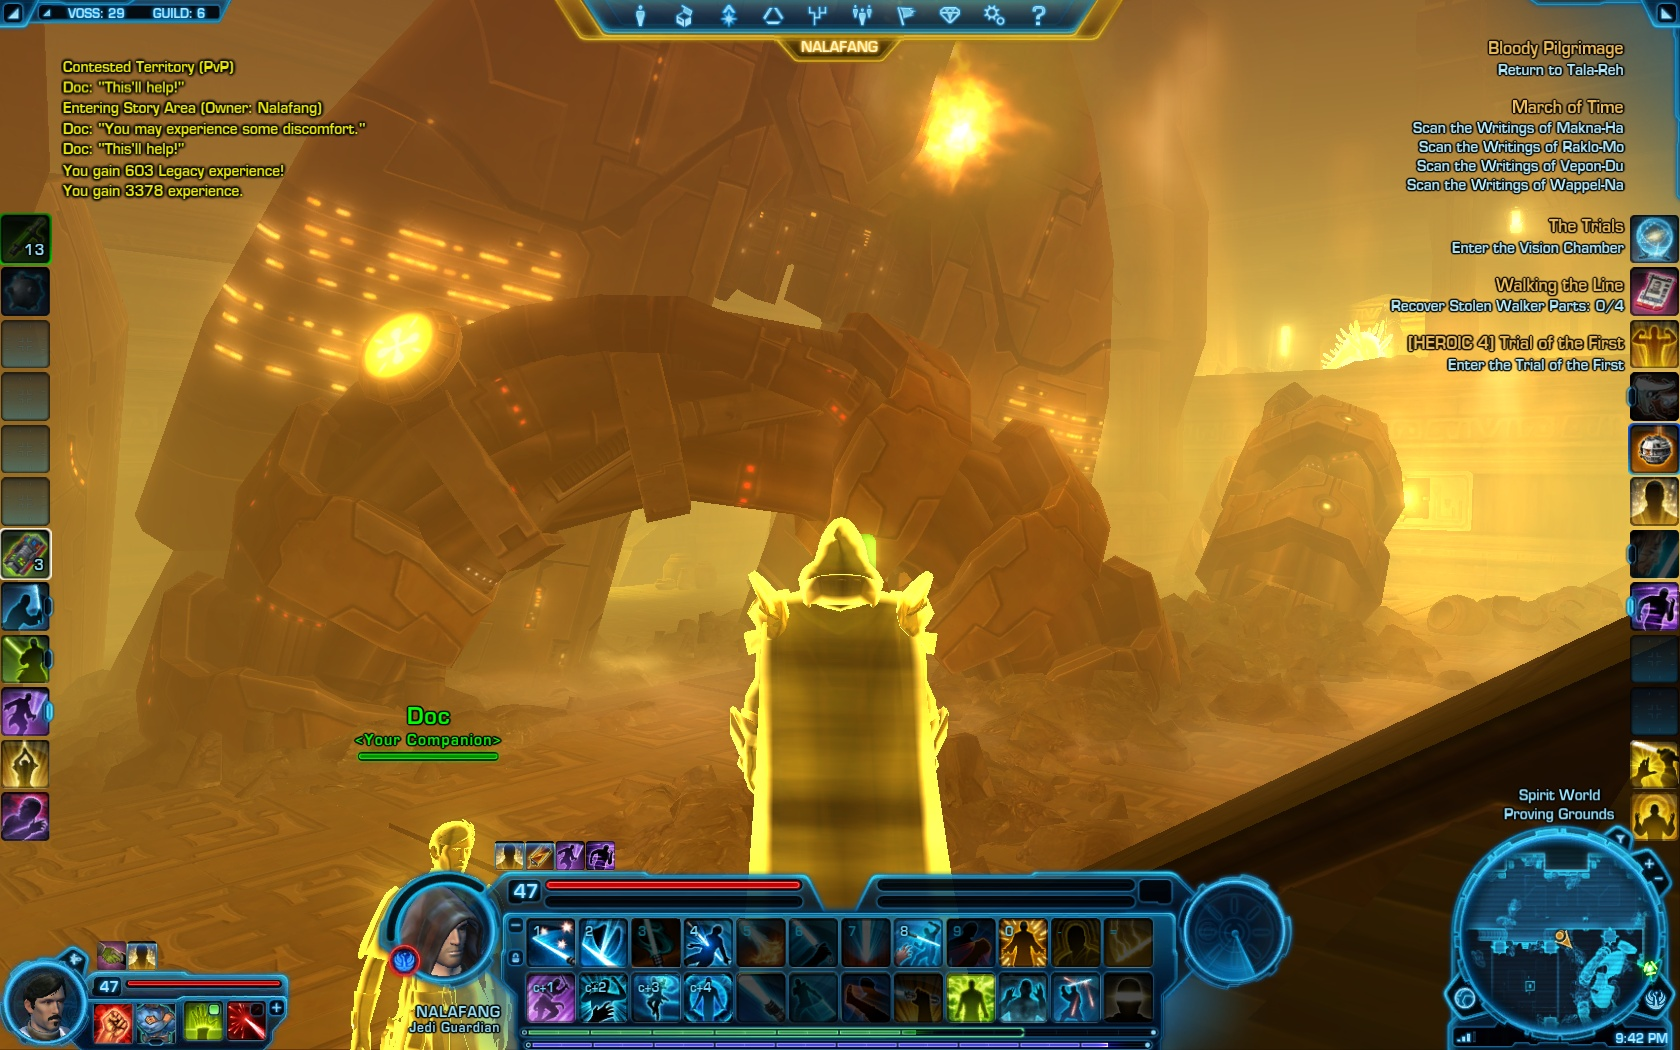 Star Wars The Old Republic Screenshot Wallpaper Voss Mystic Trials